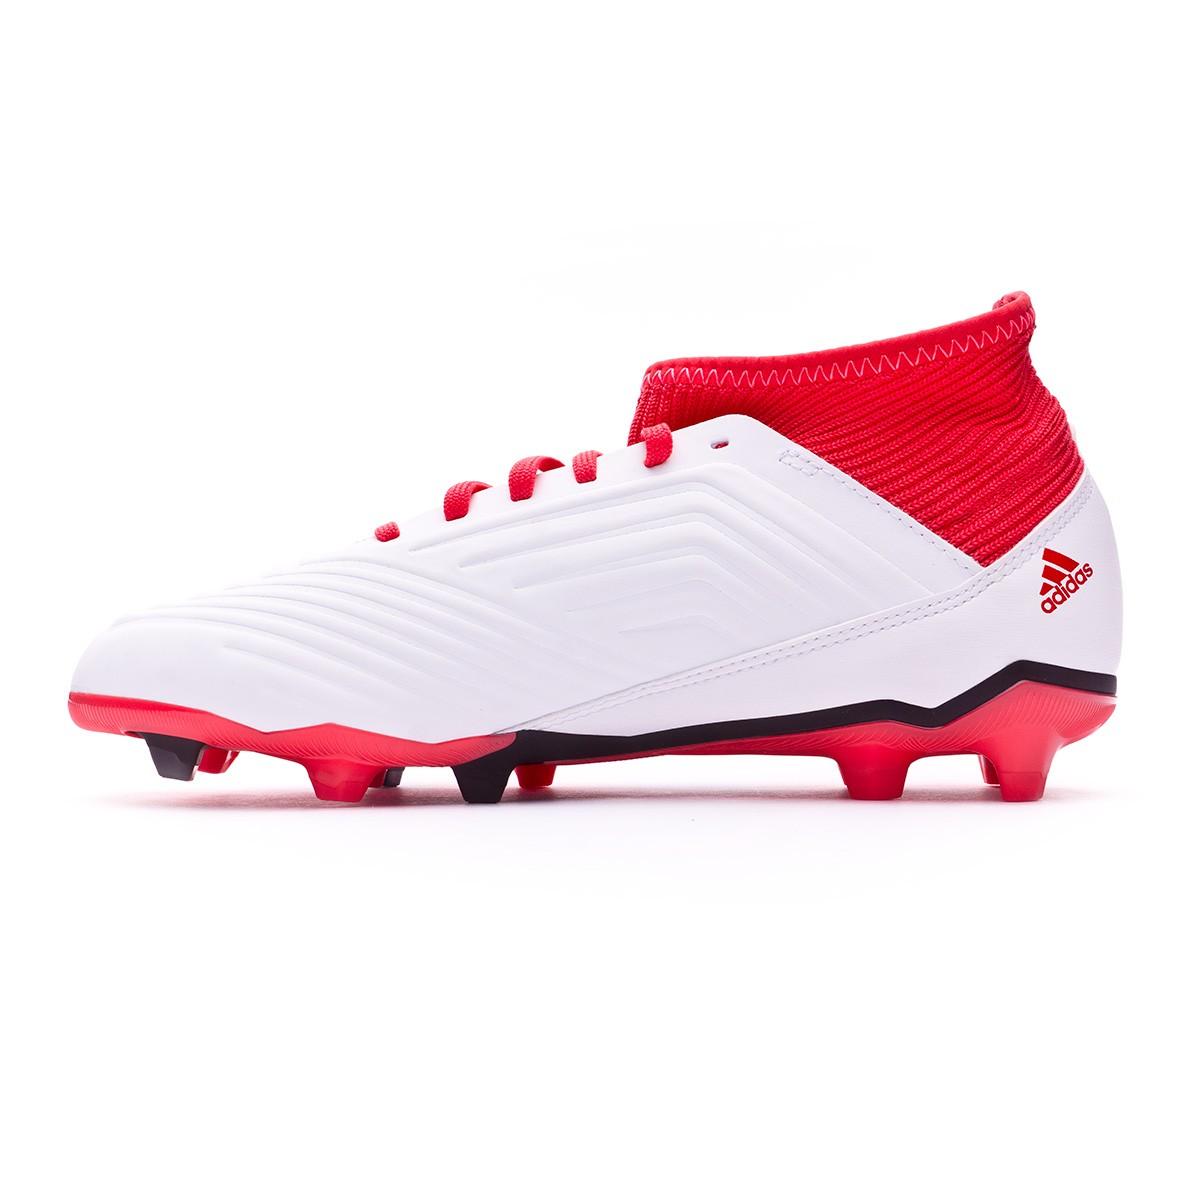 Zapatos de fútbol adidas Predator 18.3 FG Niño White-Core black-Real coral  - Soloporteros es ahora Fútbol Emotion e51c6b00f90e2